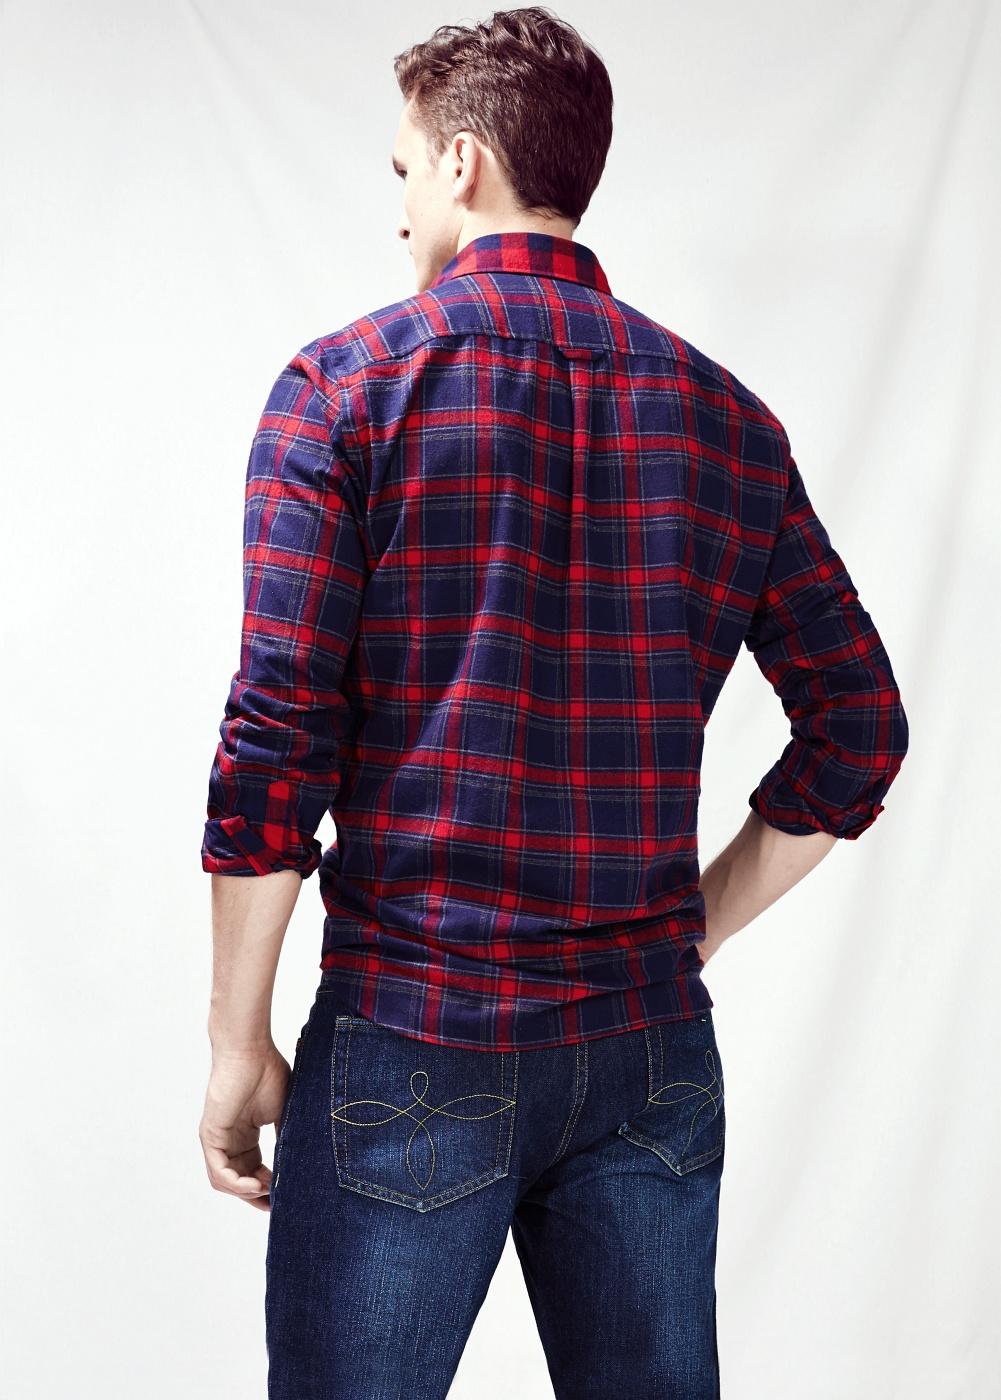 Camisa de cuadros classic-fit y jeans vintage